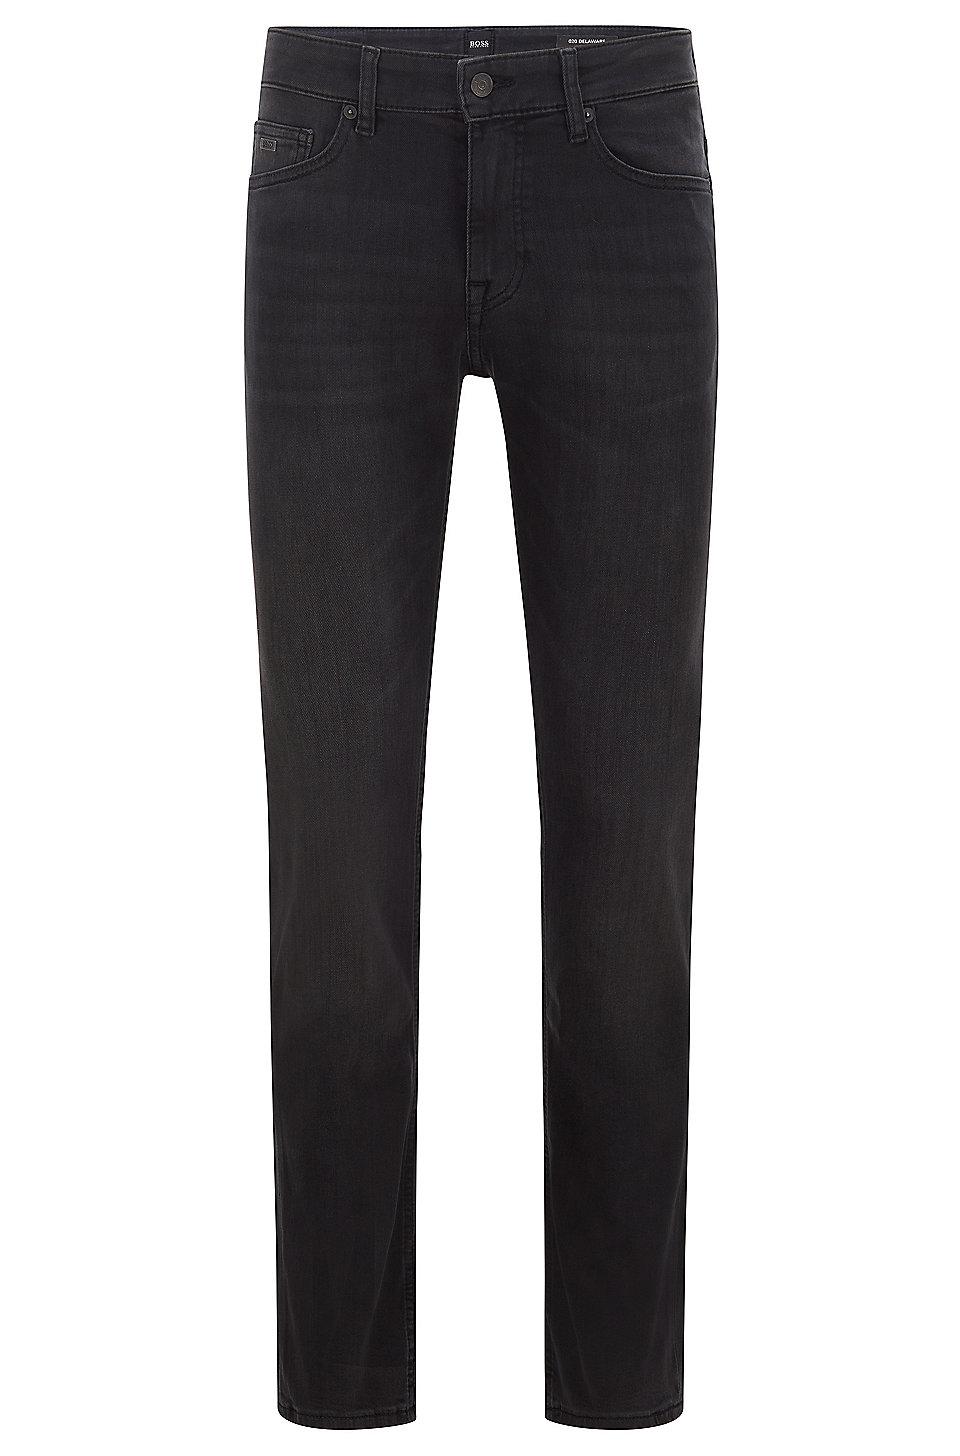 SLIM FIT 50392567 HUGO BOSS Stretch-Jeans W33//L34 Charleston3